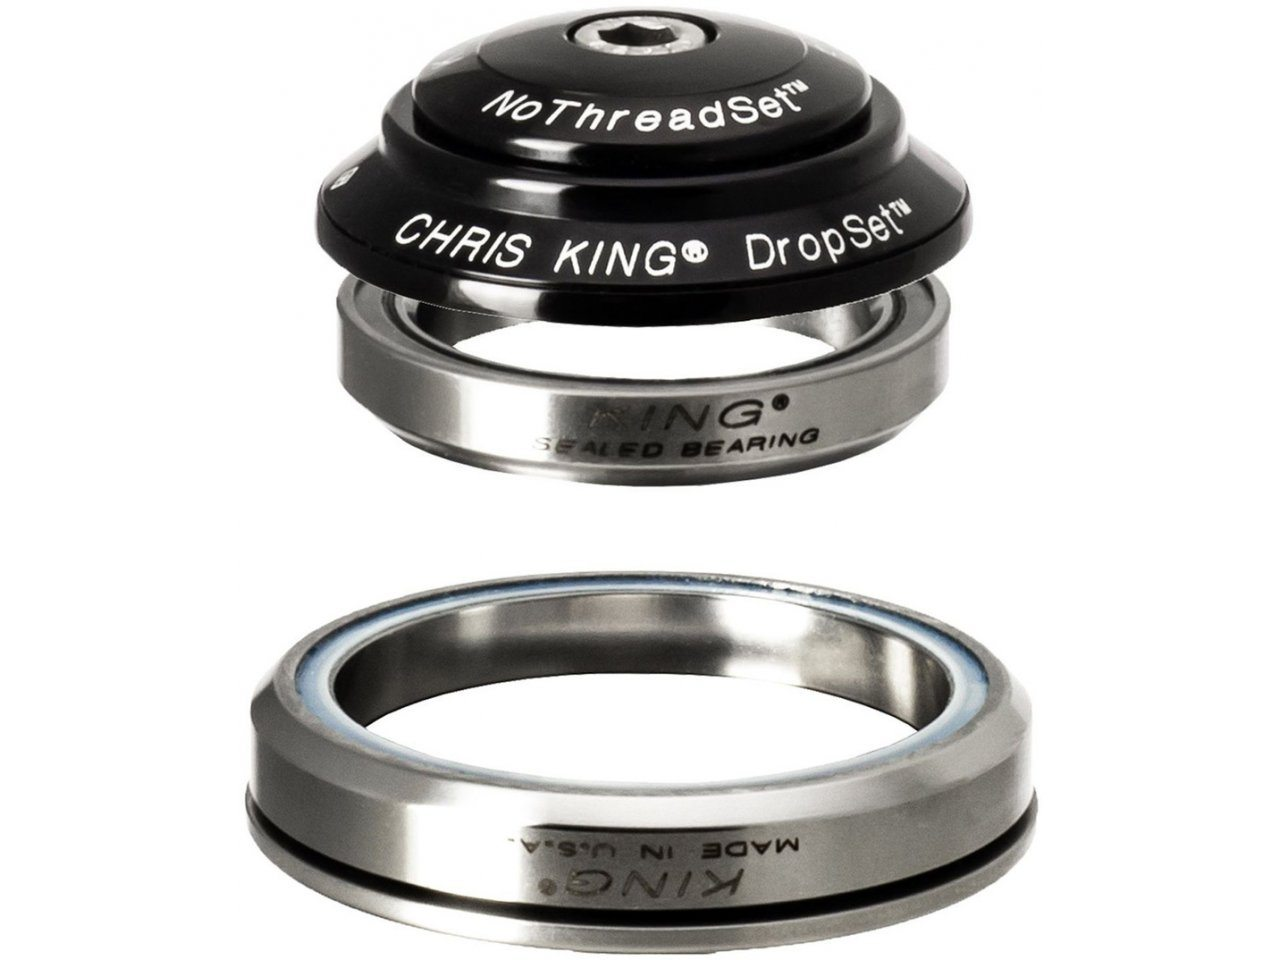 Chris King Dropset 3